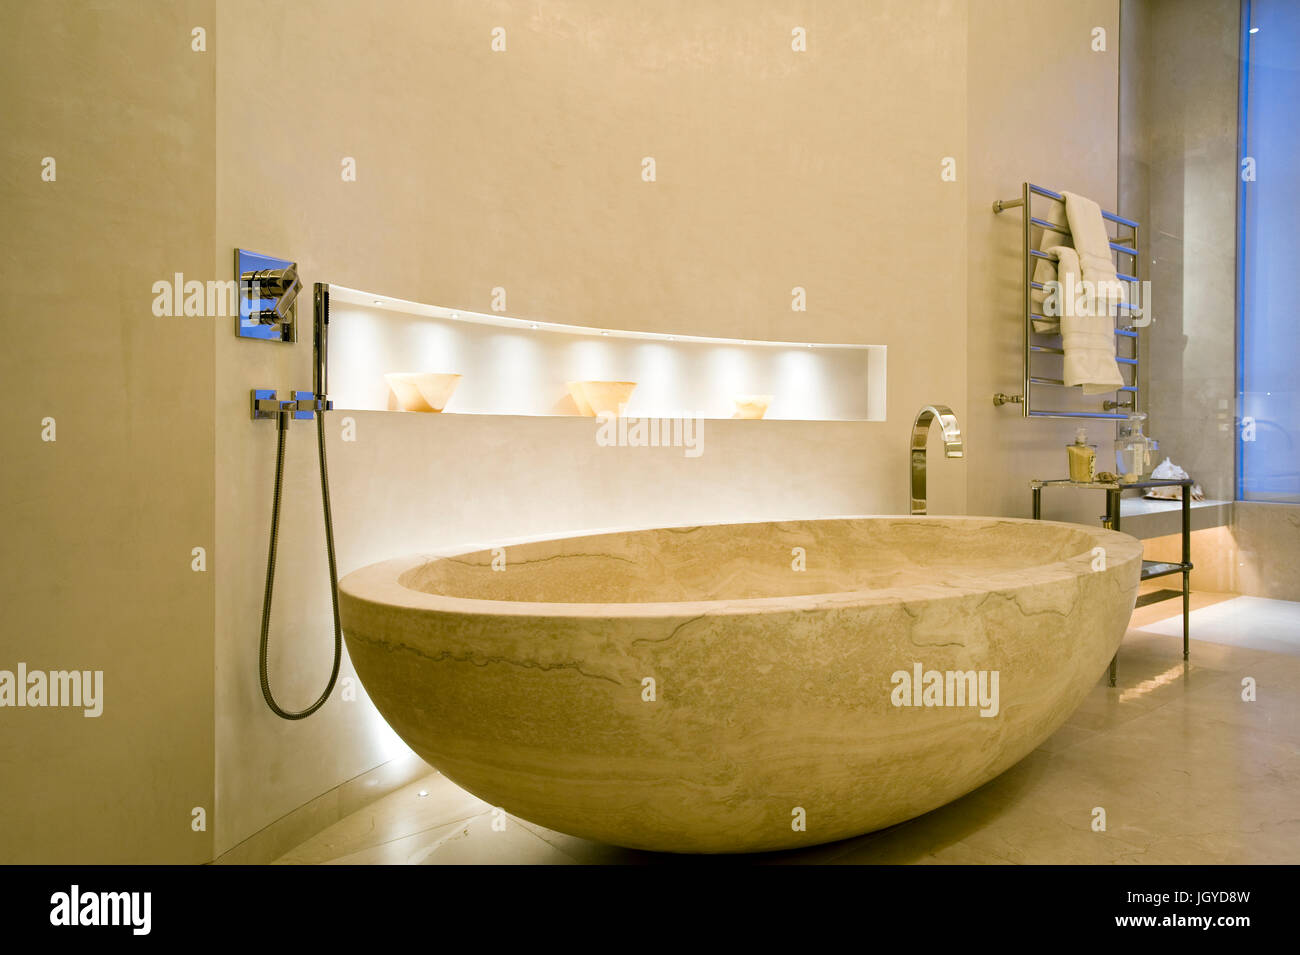 Stone bathtub at night - Stock Image